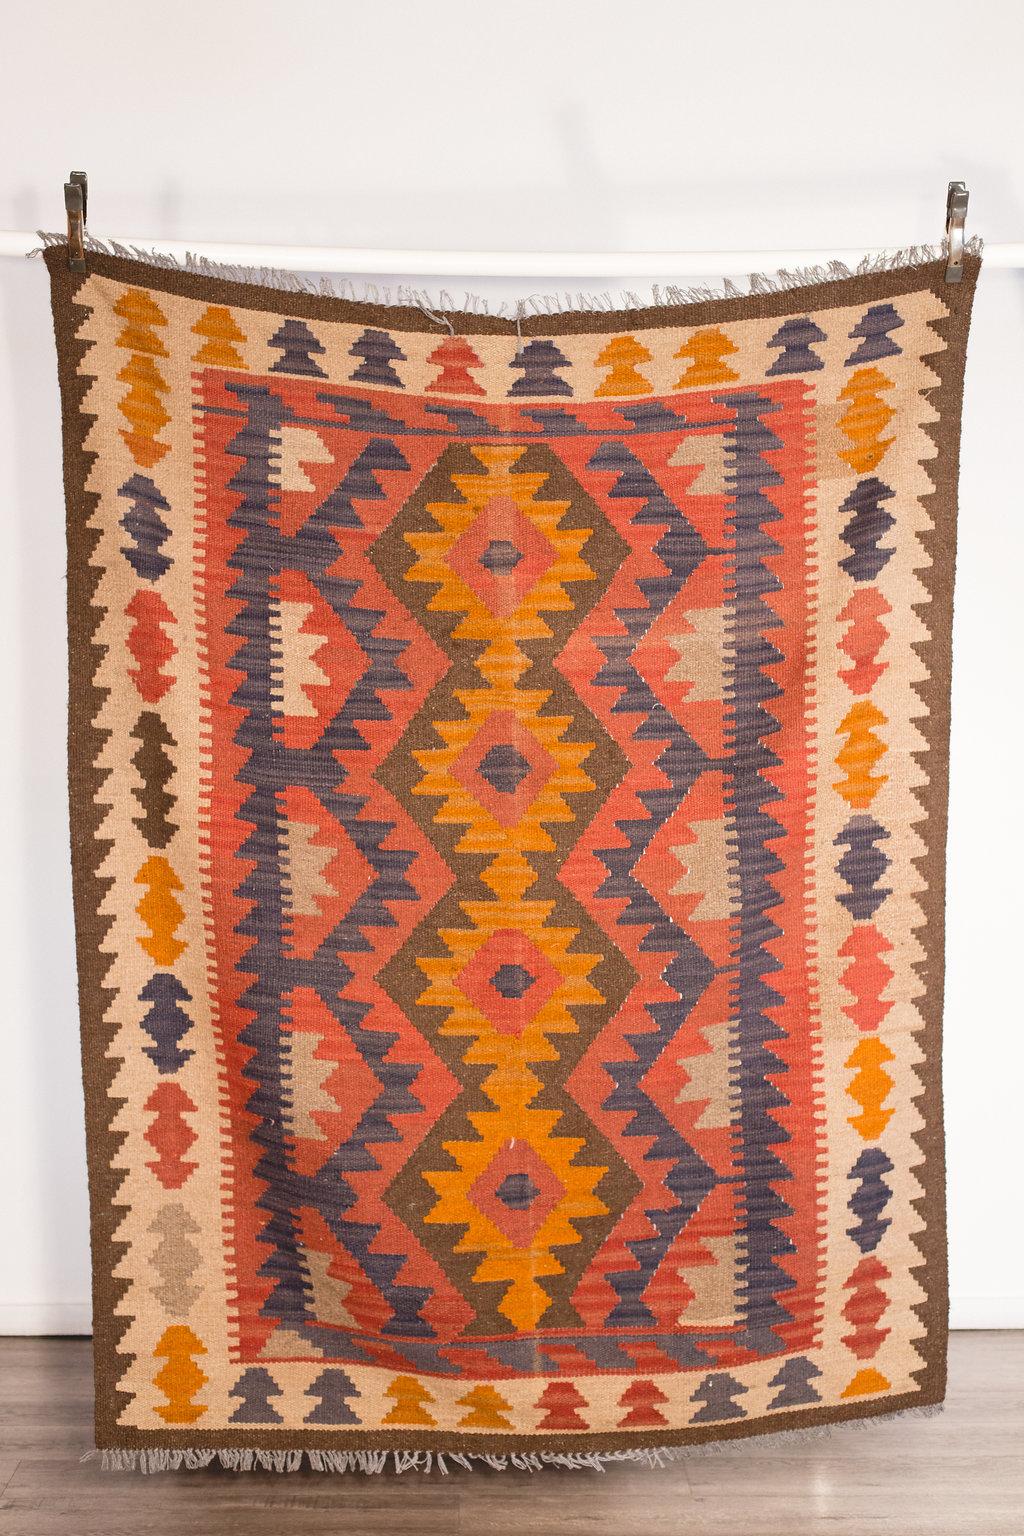 Aztec Rug Small 6.5'x 5' Quantity: 1 Price: $125